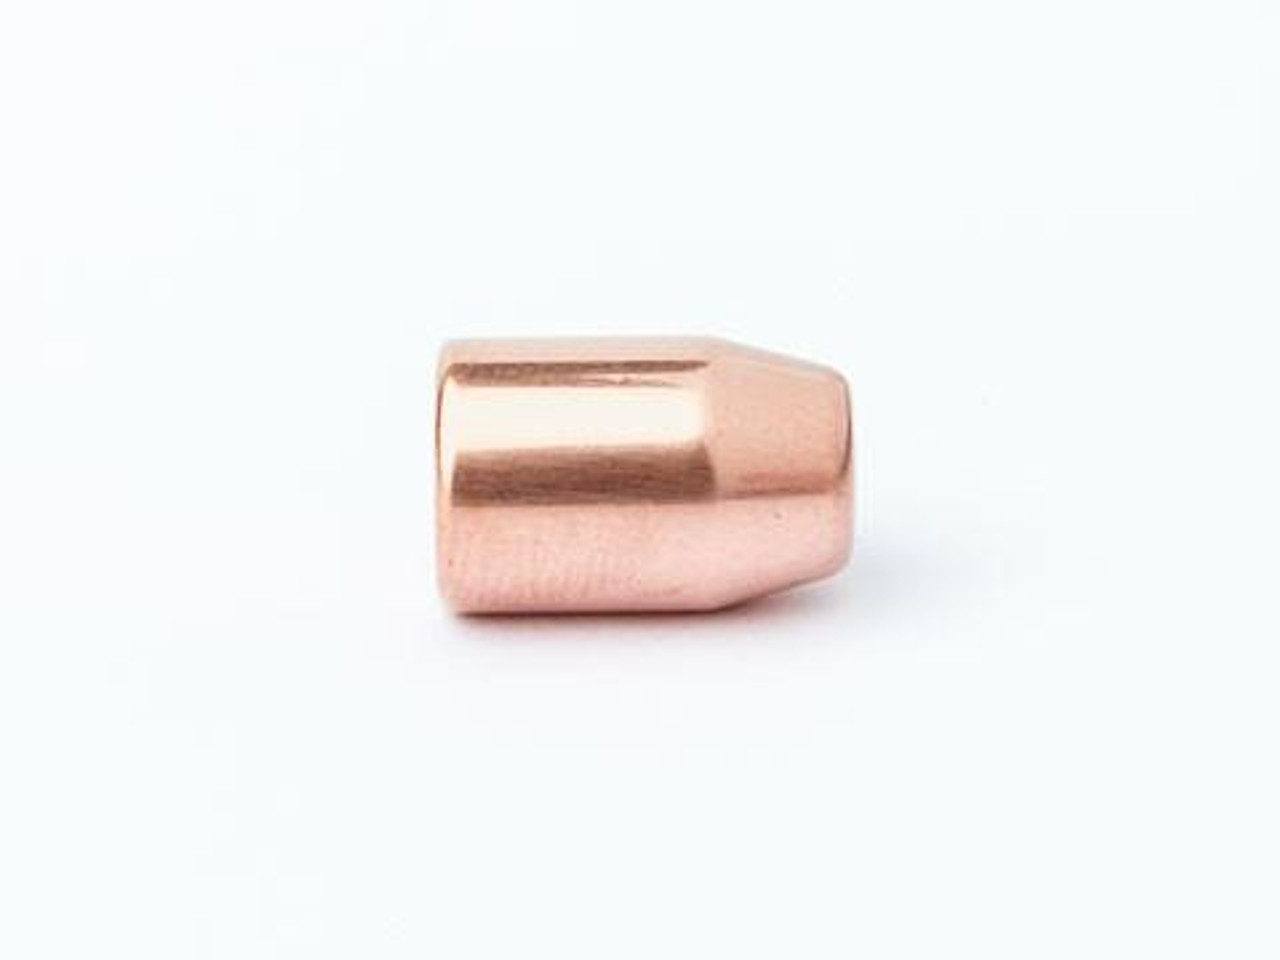 CAM PRO 10mm/.40 180GR HP / 1000